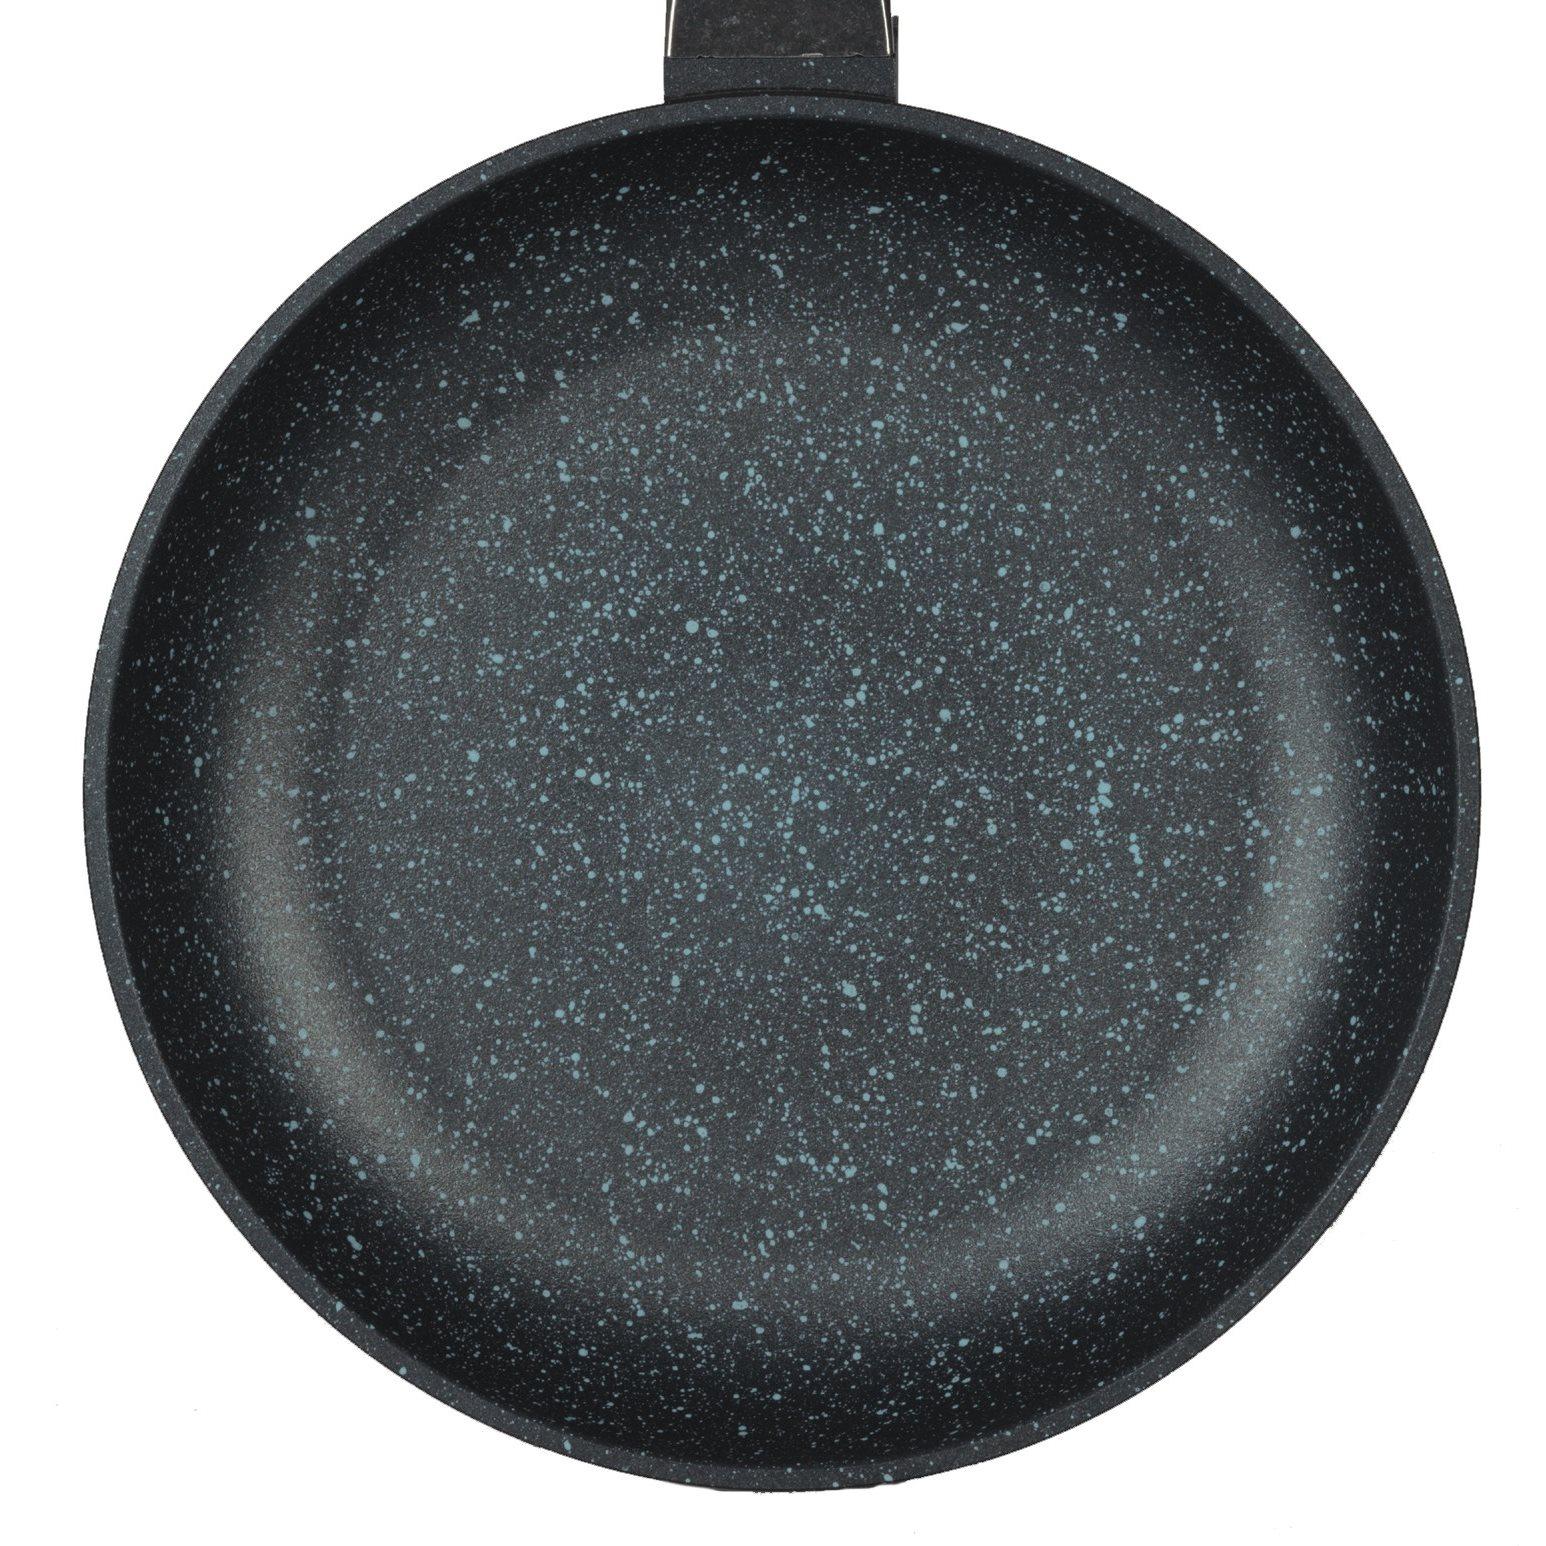 gsw bratpfanne titanium granit 24 cm flach 4005643453240 ebay. Black Bedroom Furniture Sets. Home Design Ideas